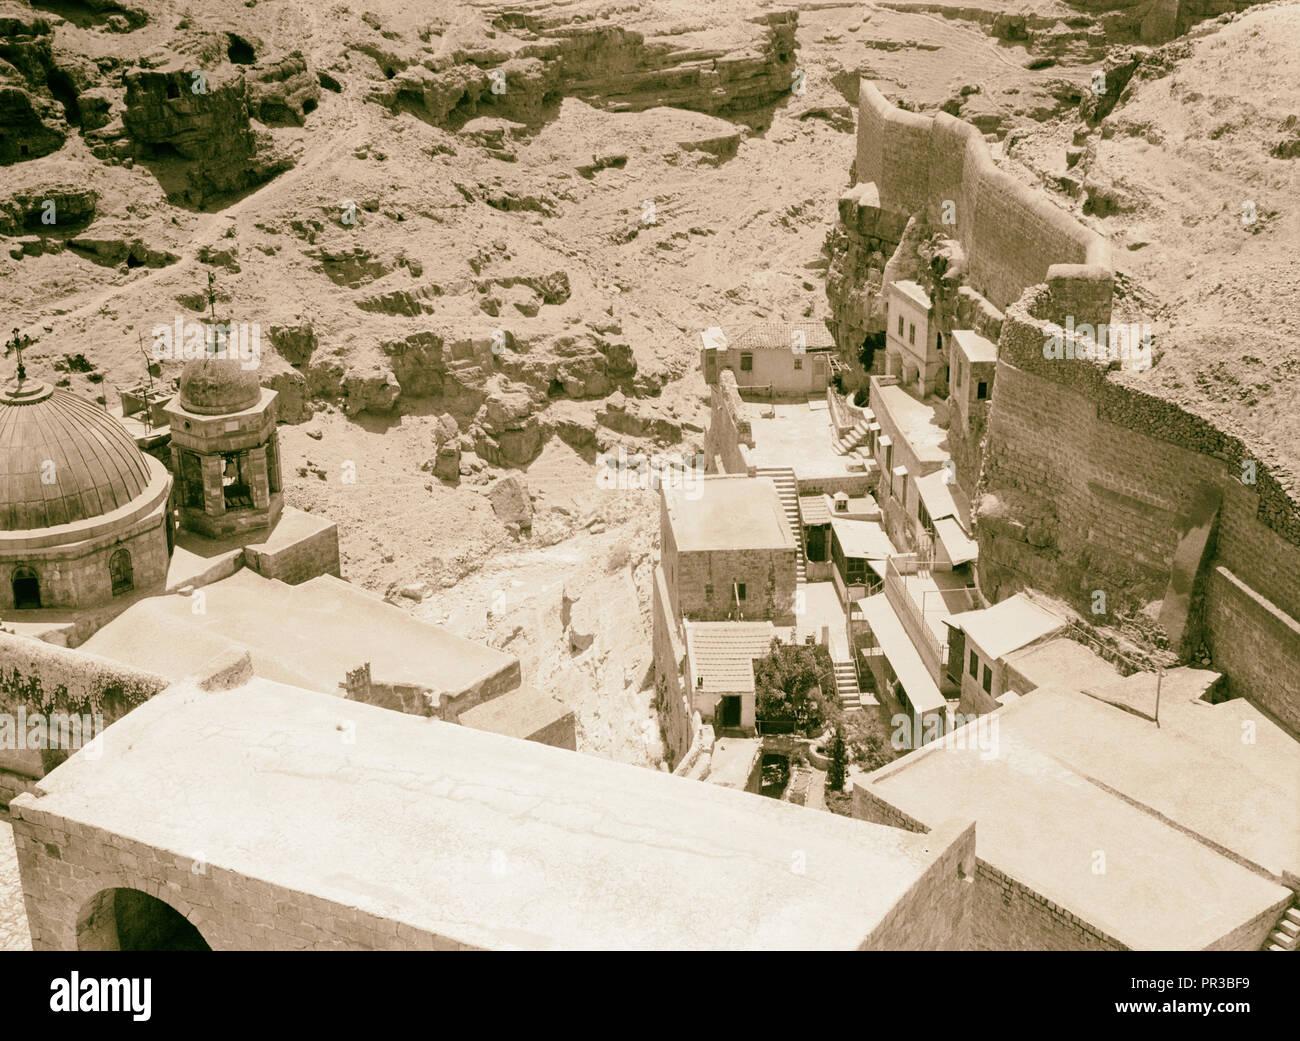 Mar Saba. Convent enclosure 1934, West Bank - Stock Image